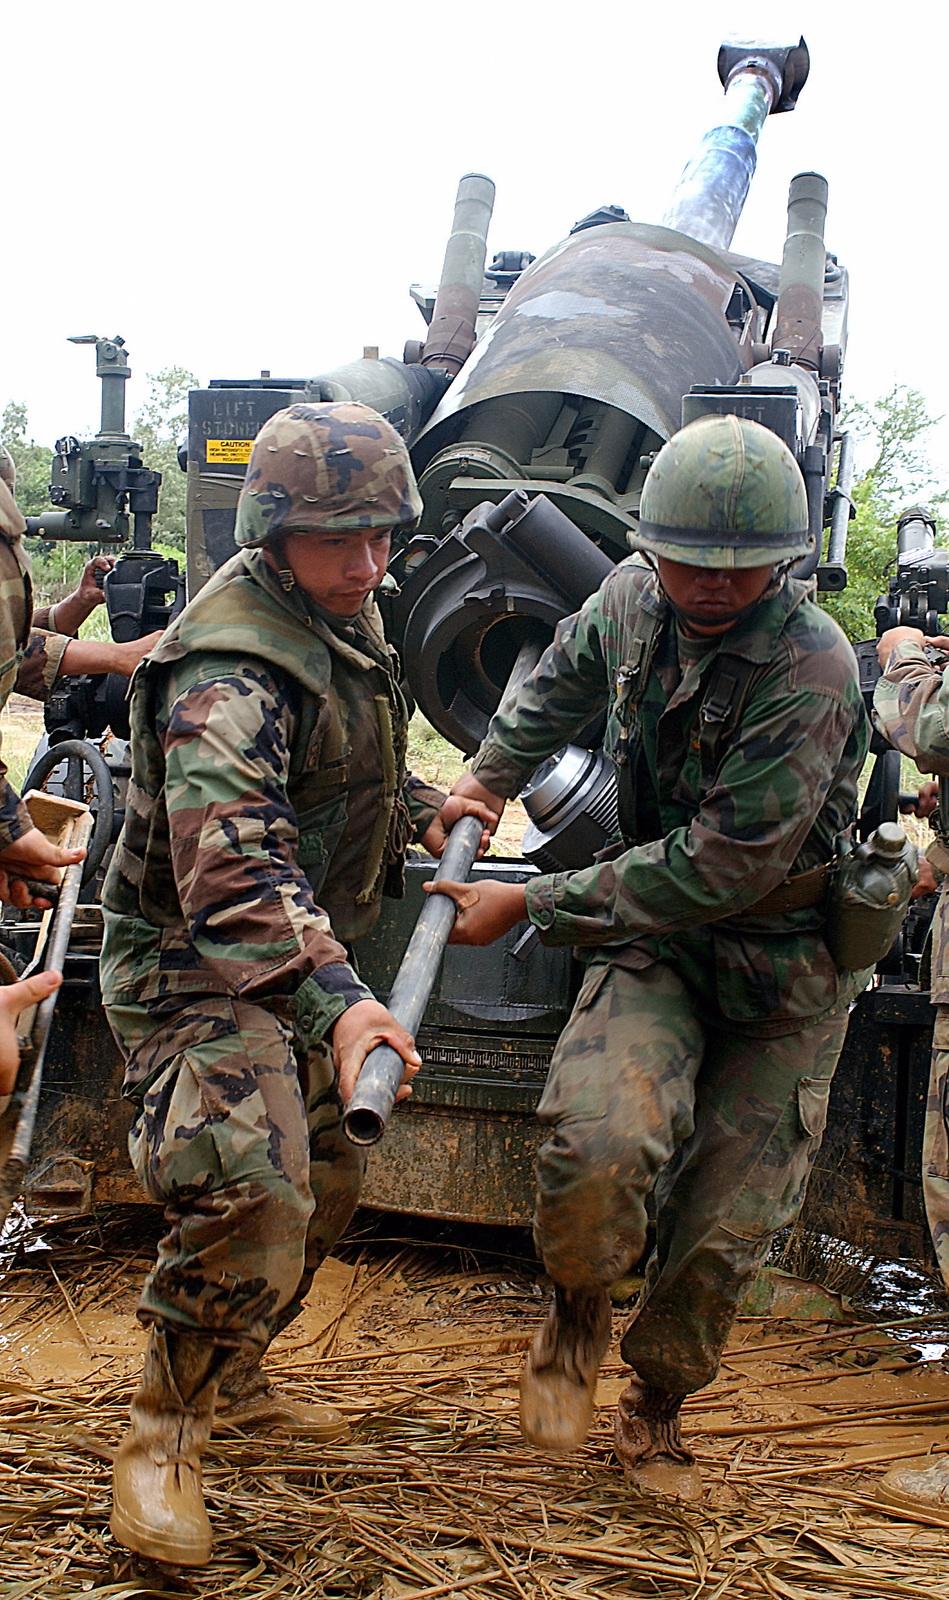 A US Marine Corps (USMC) Marine (left) and a Royal Thai Marine